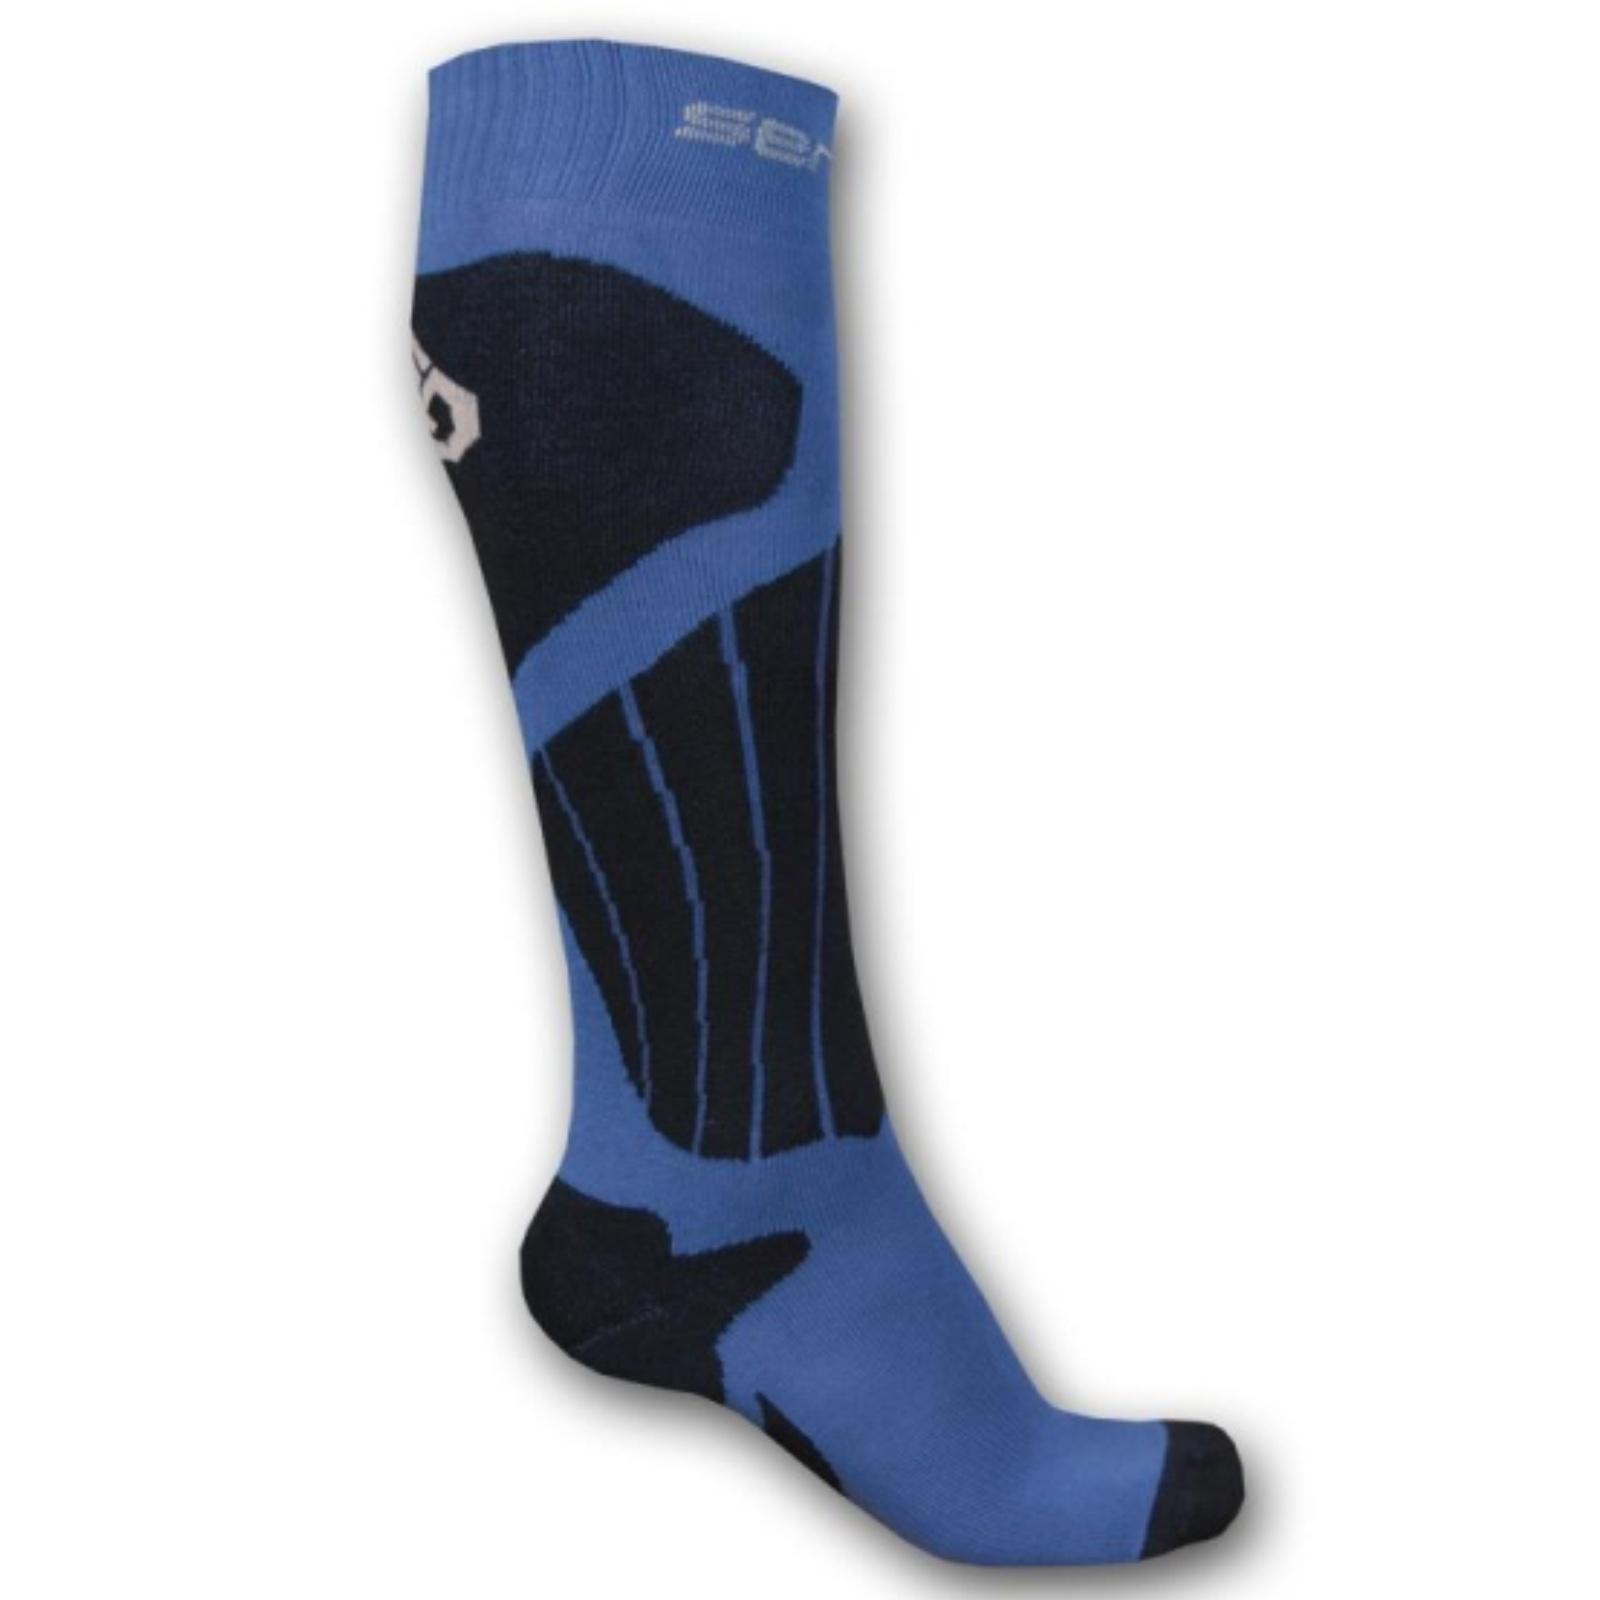 Ponožky SENSOR ThermoSnow šedo-modré vel. 6-8